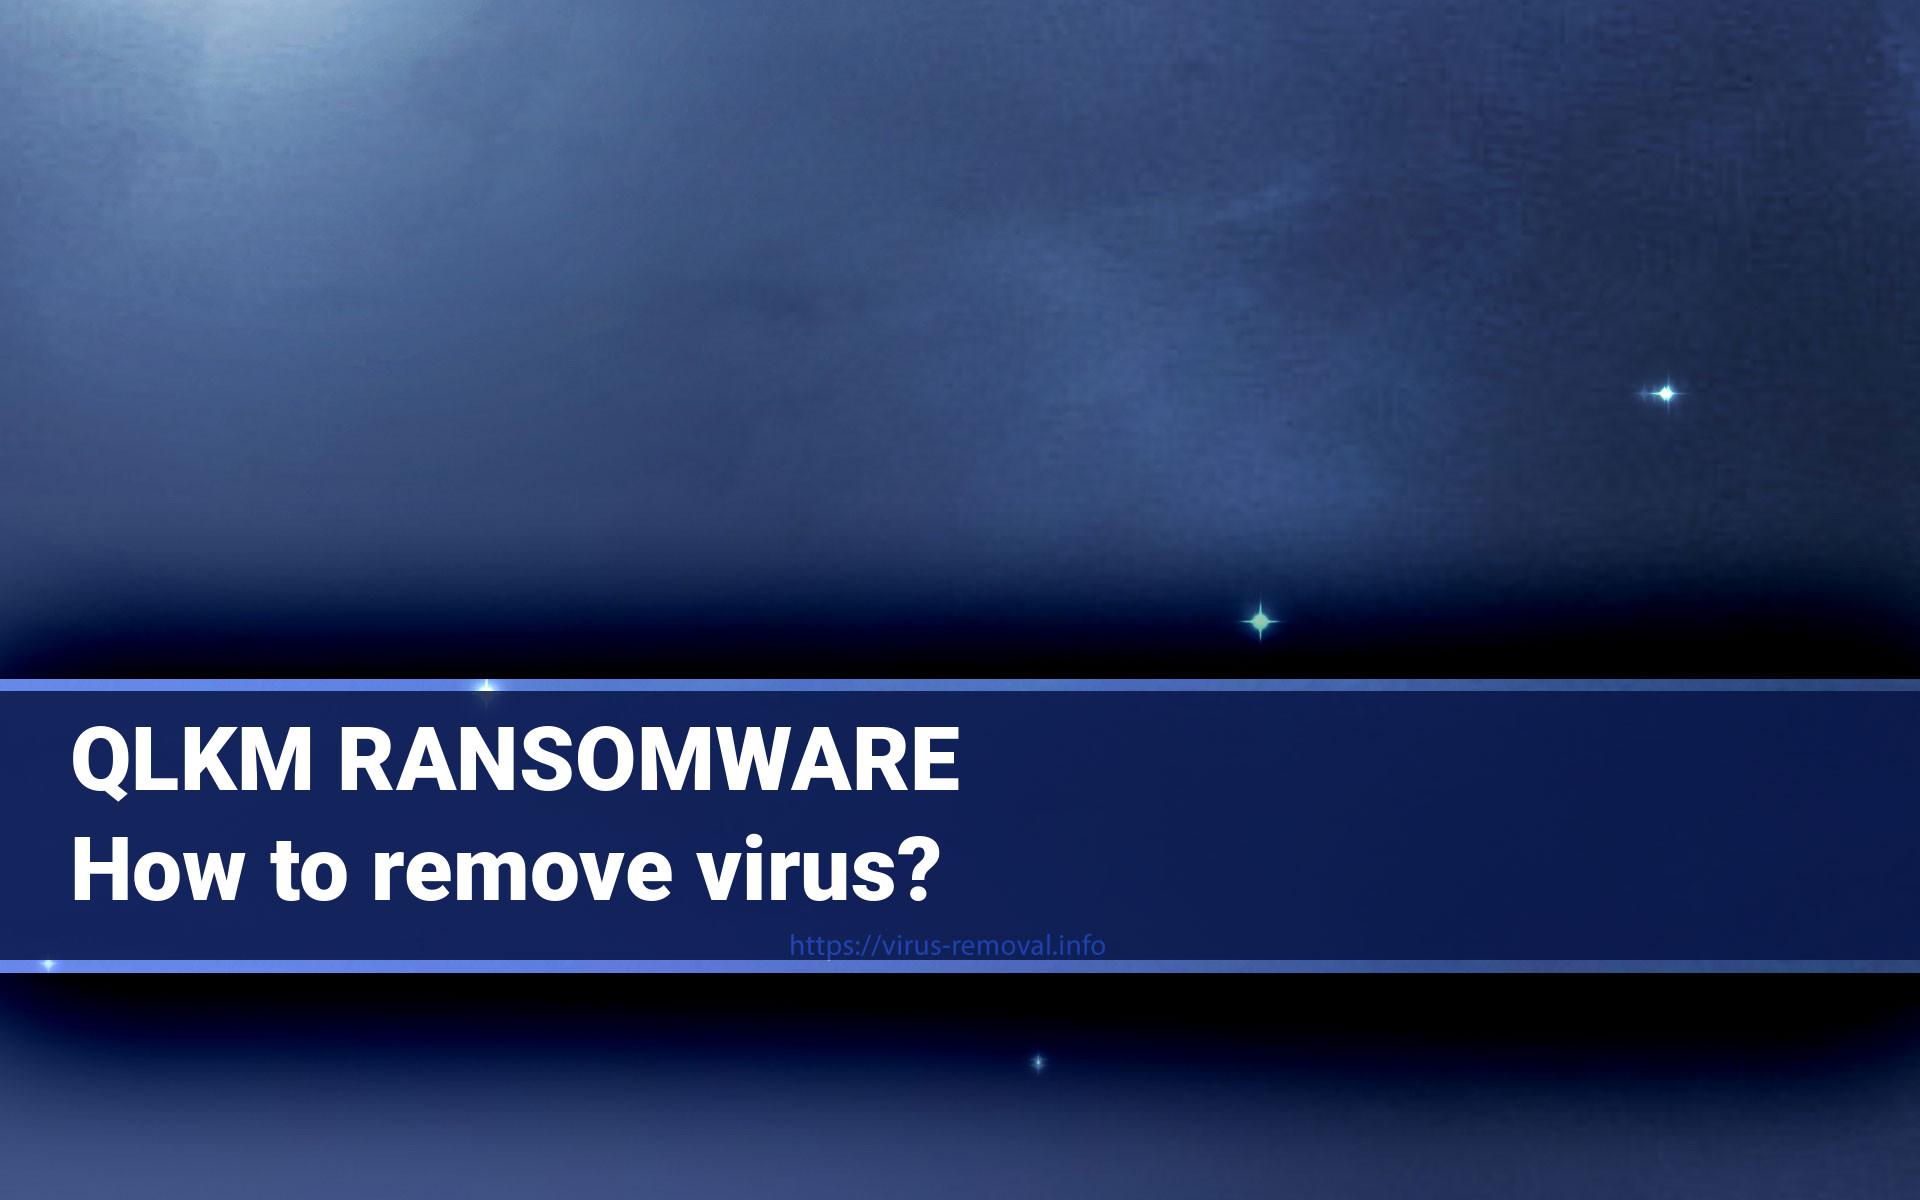 QLKM Ransomware